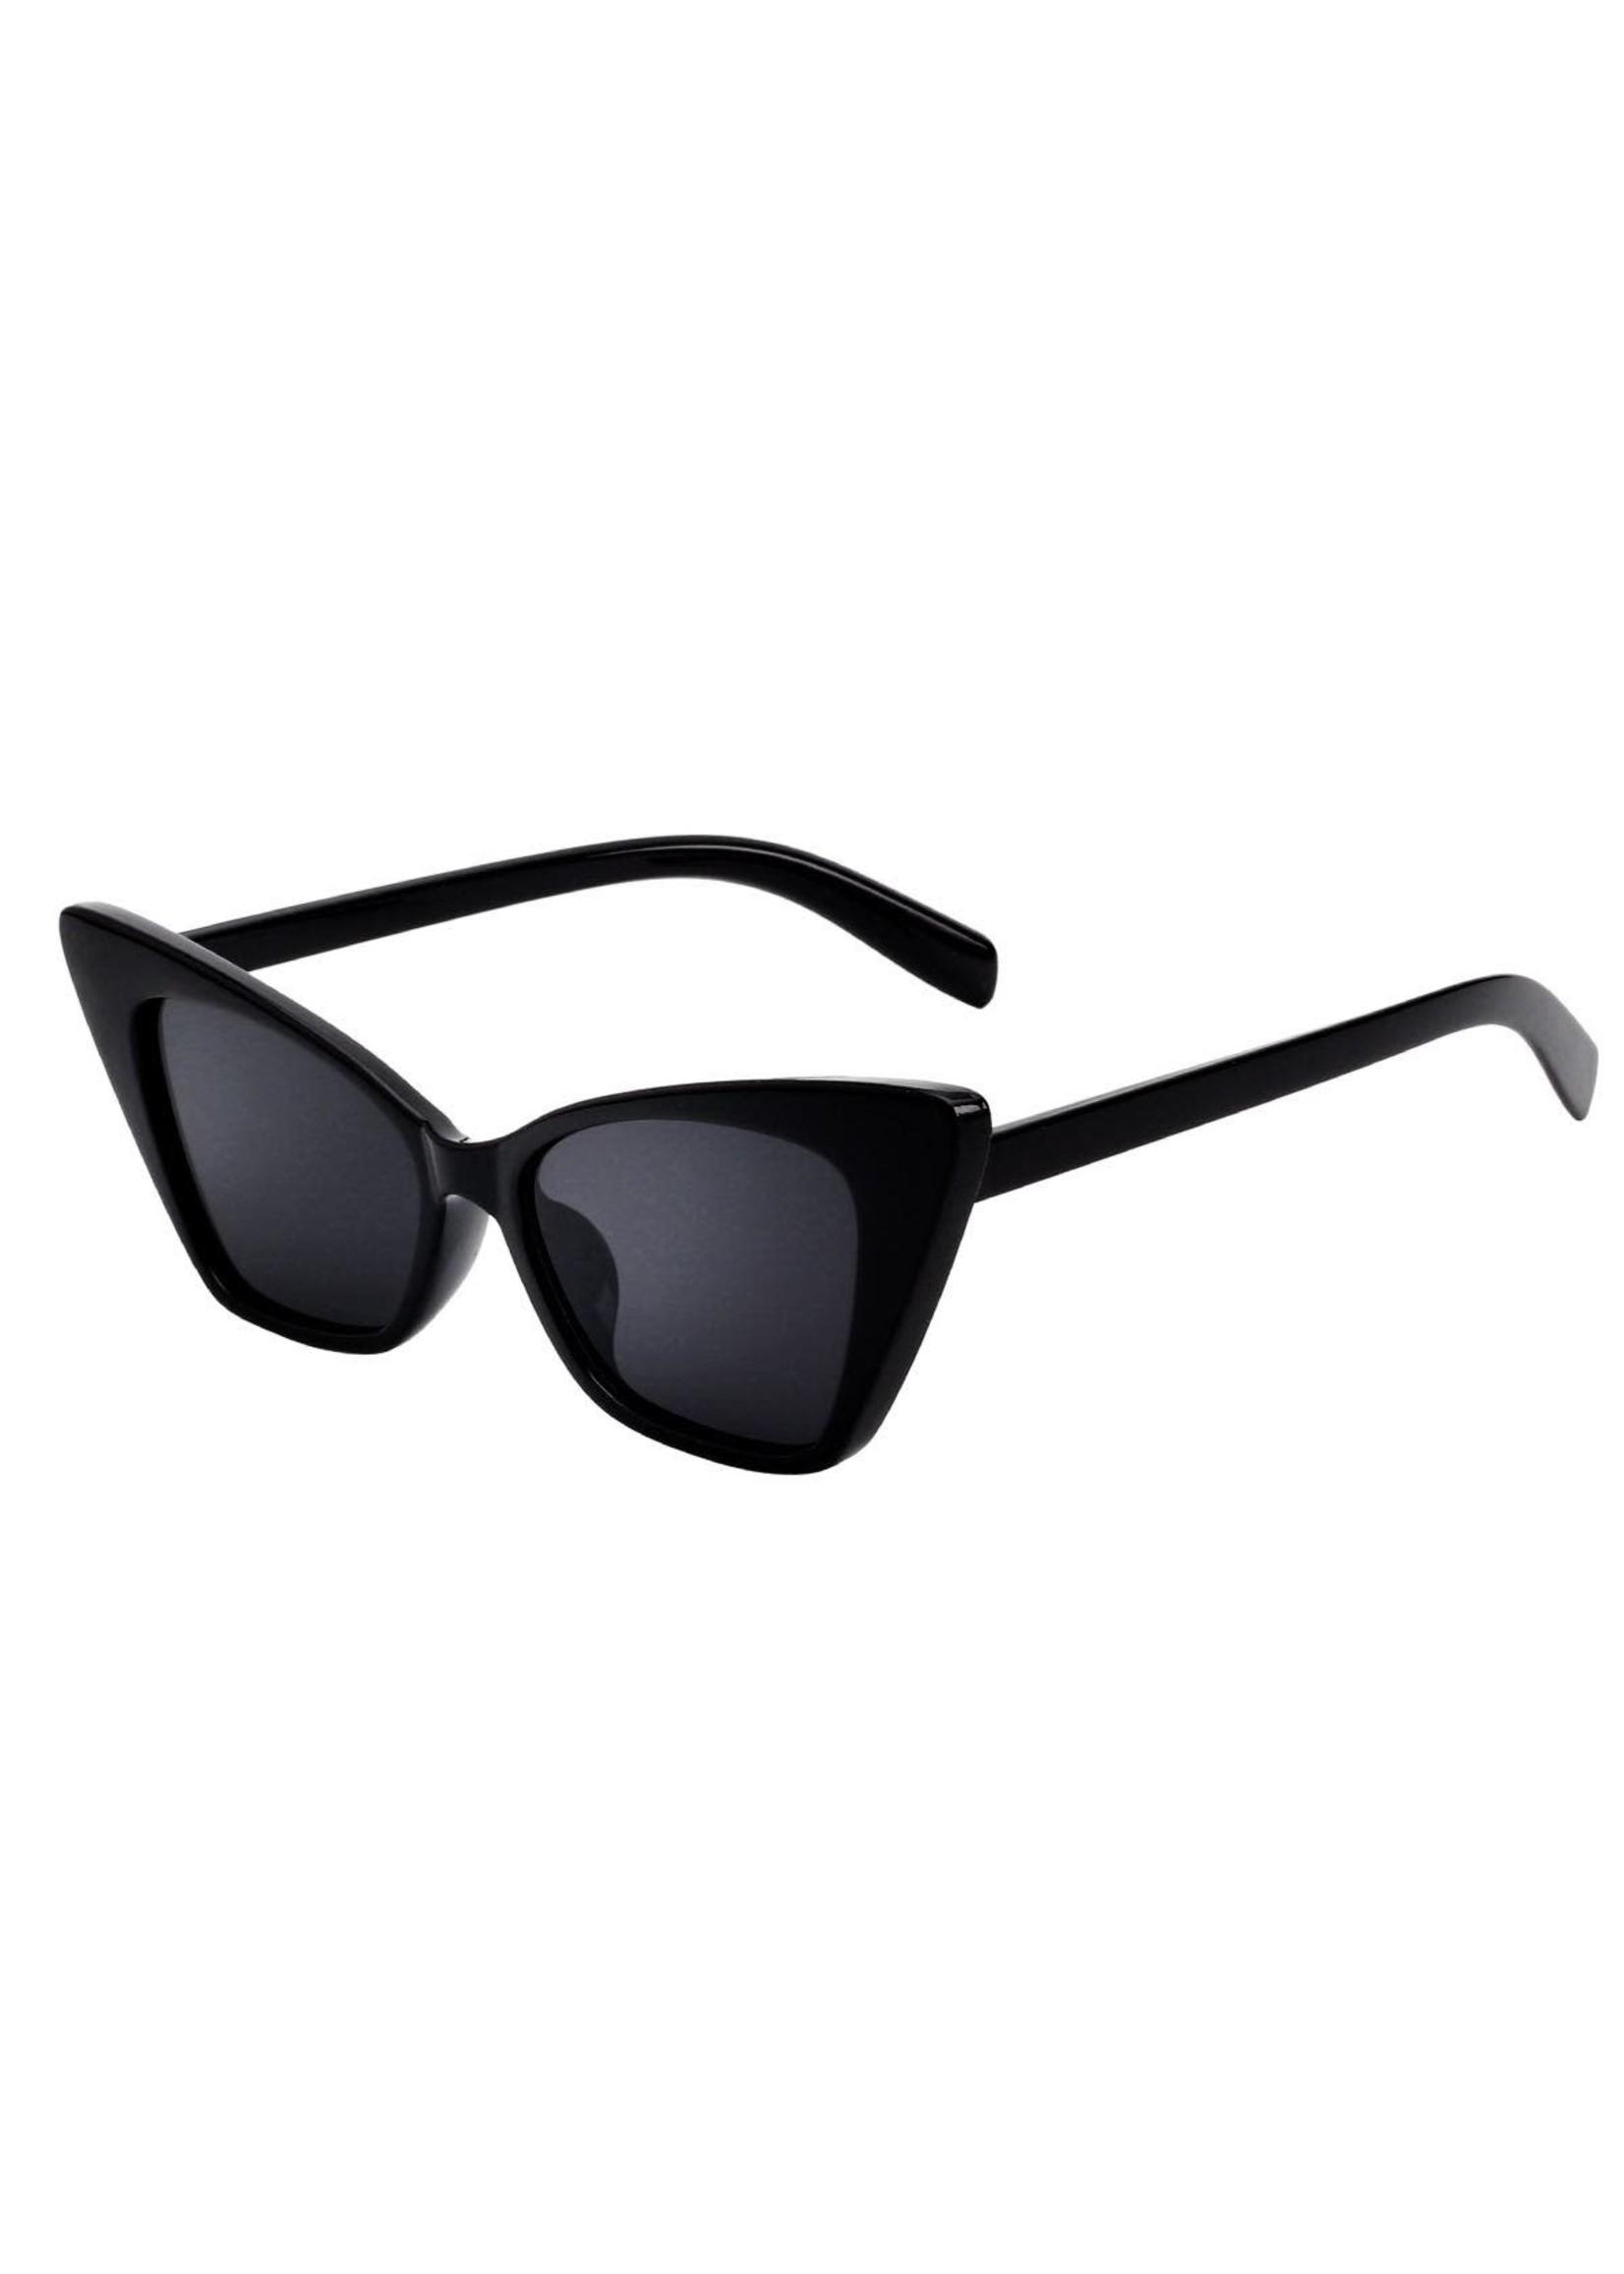 NewYork Sunglasses Cateye Black